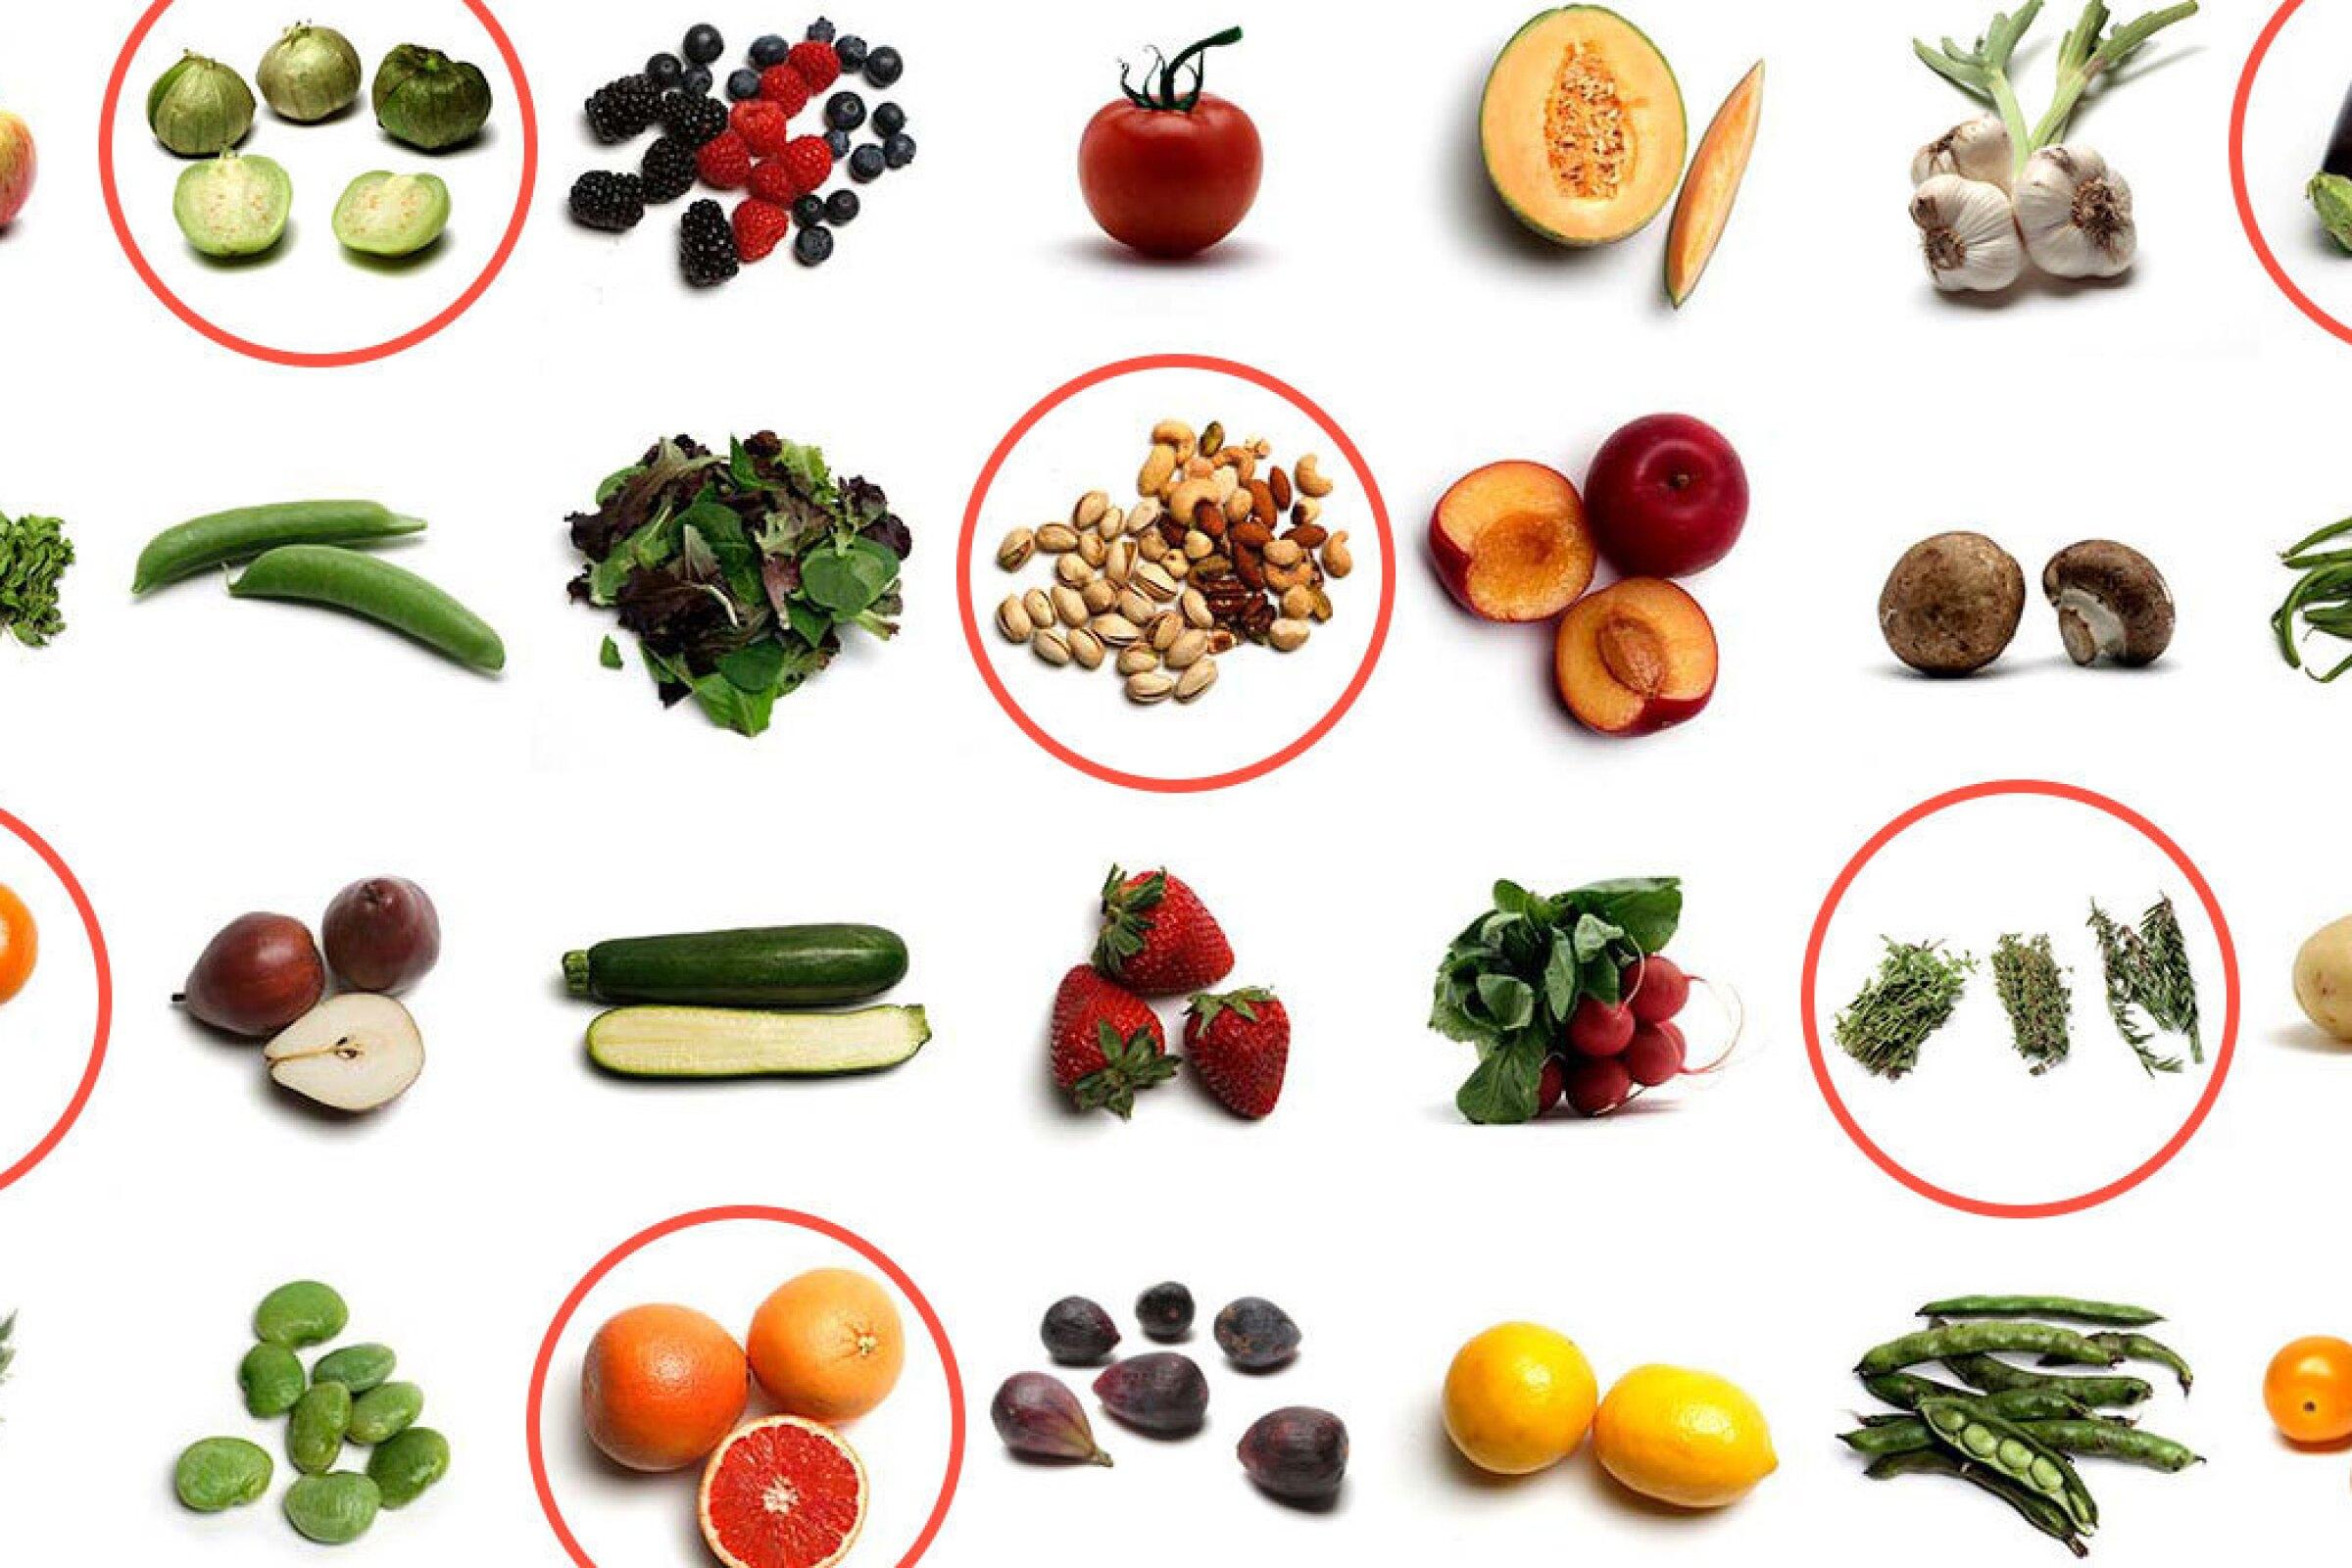 what fruit is in season in april in california